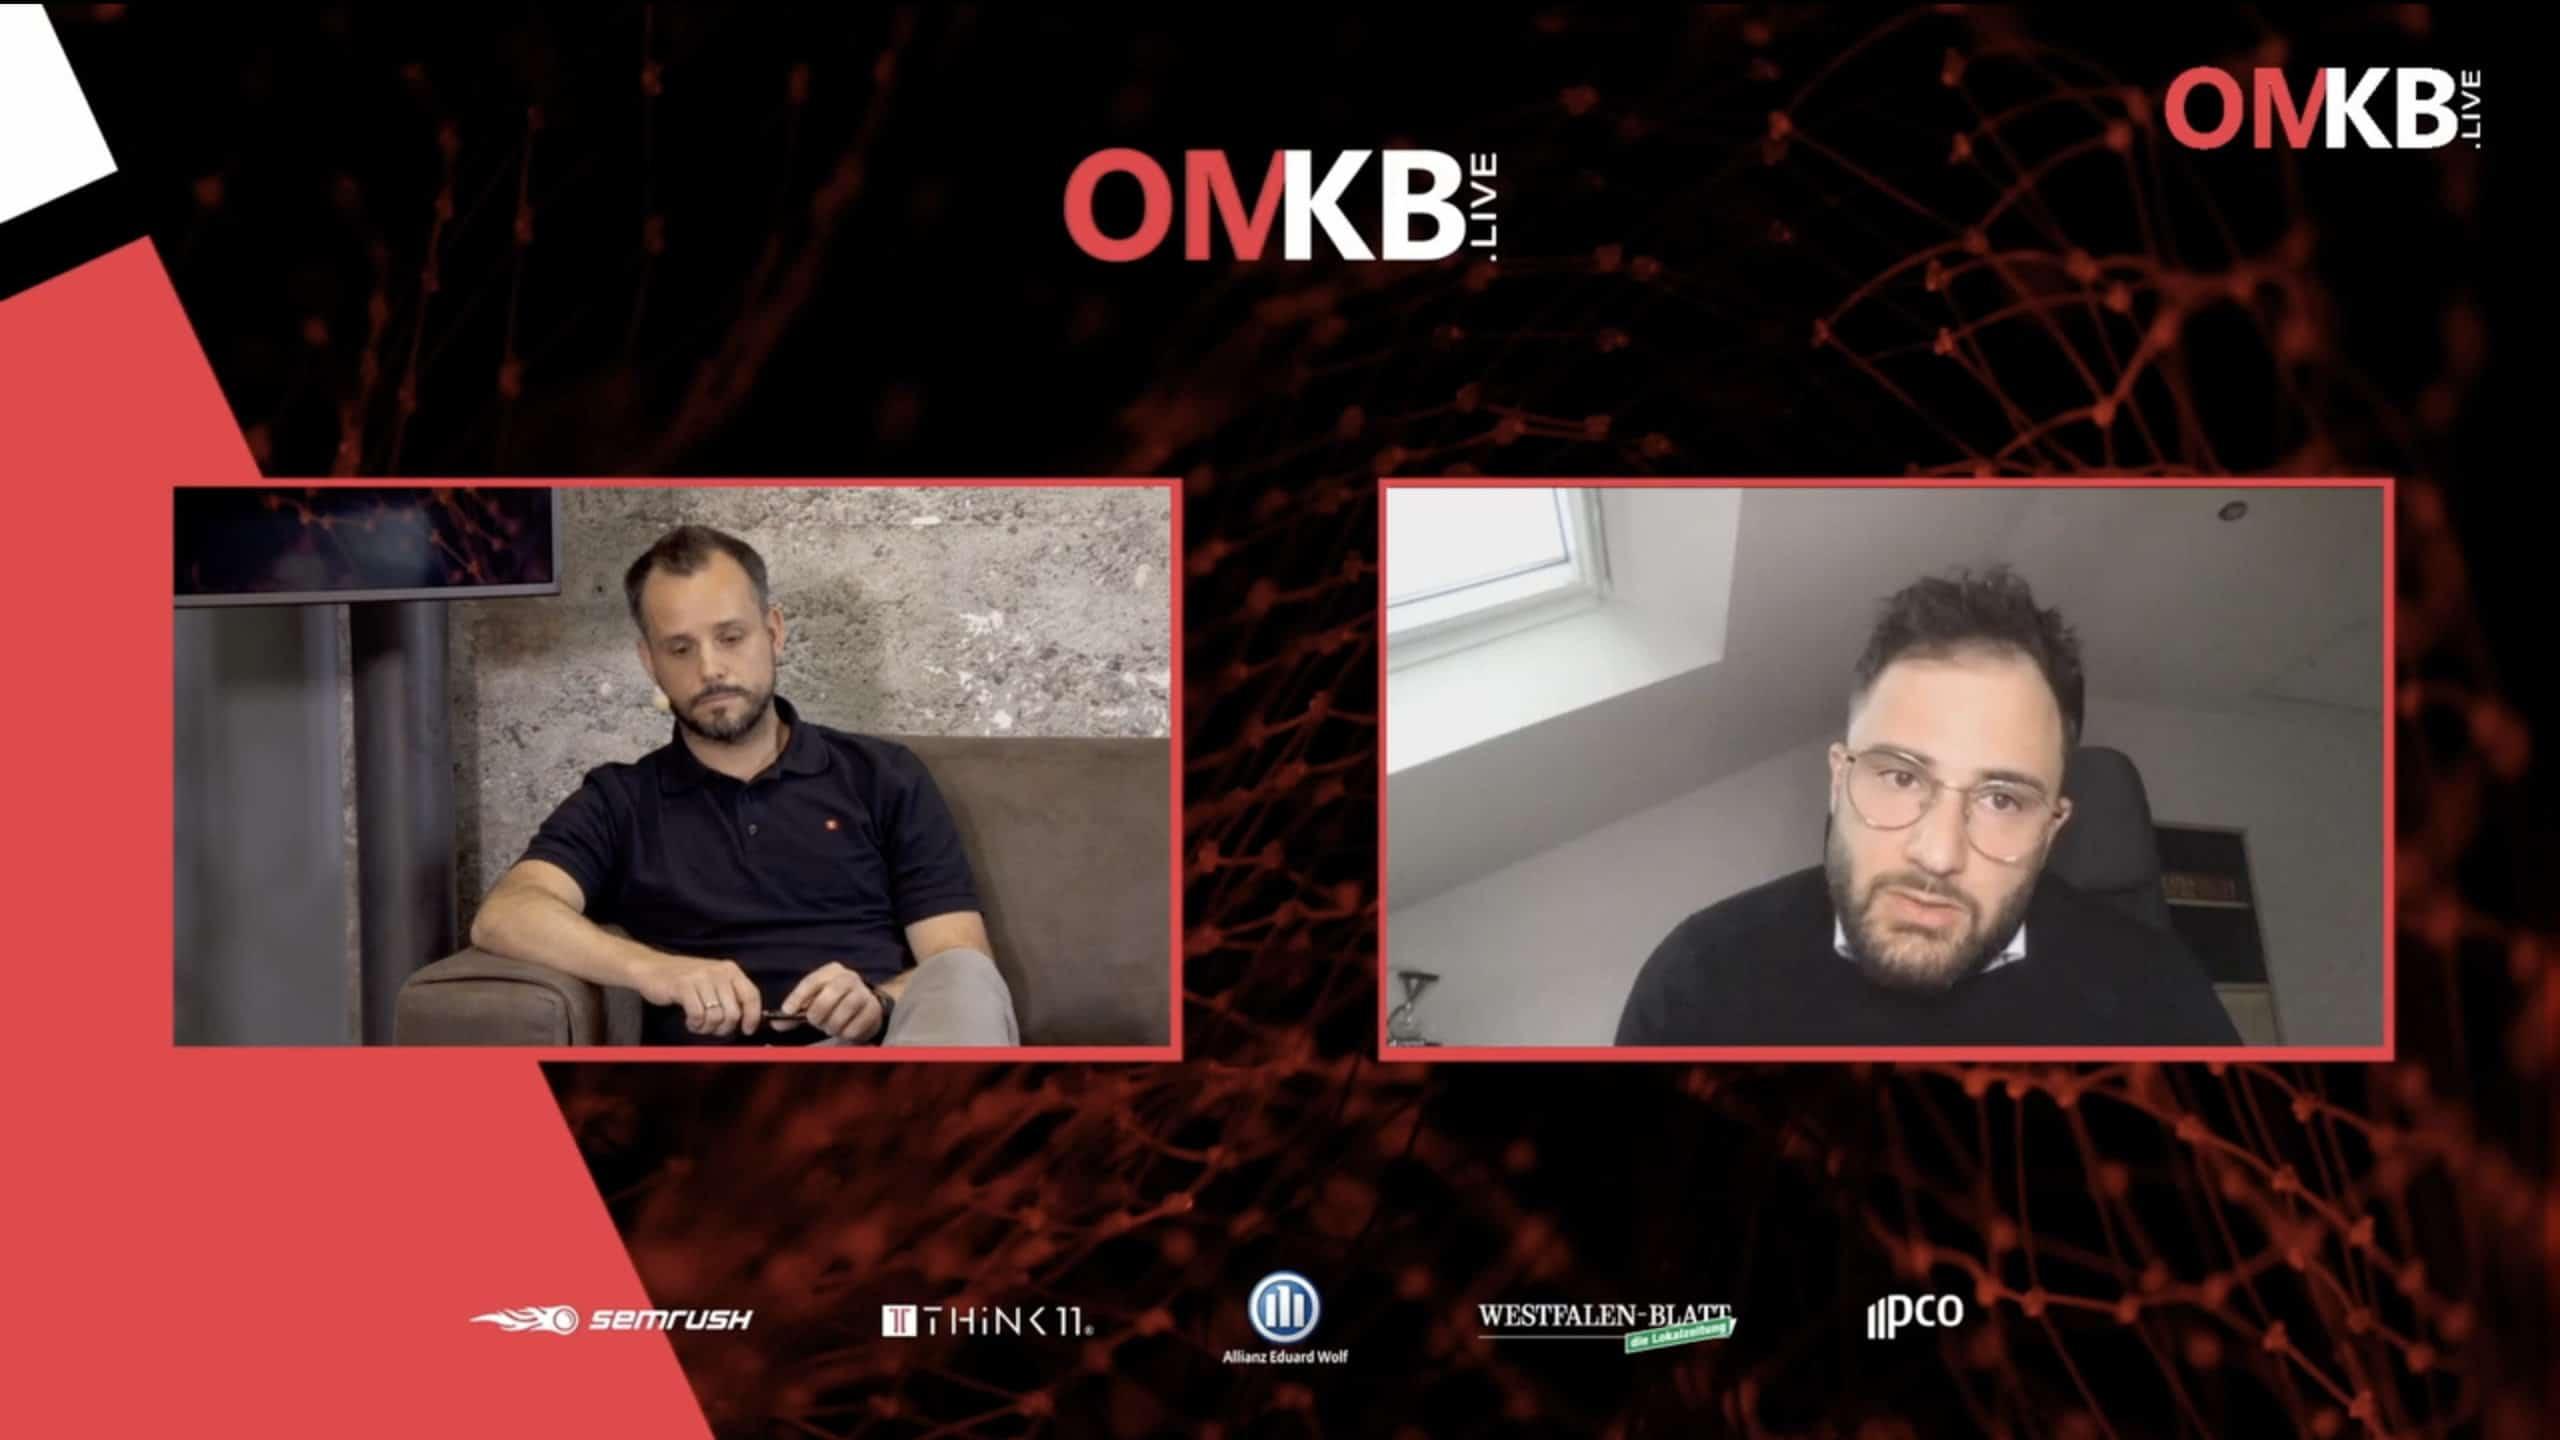 Jonas Rashedi OMKB.live hosted by Think11